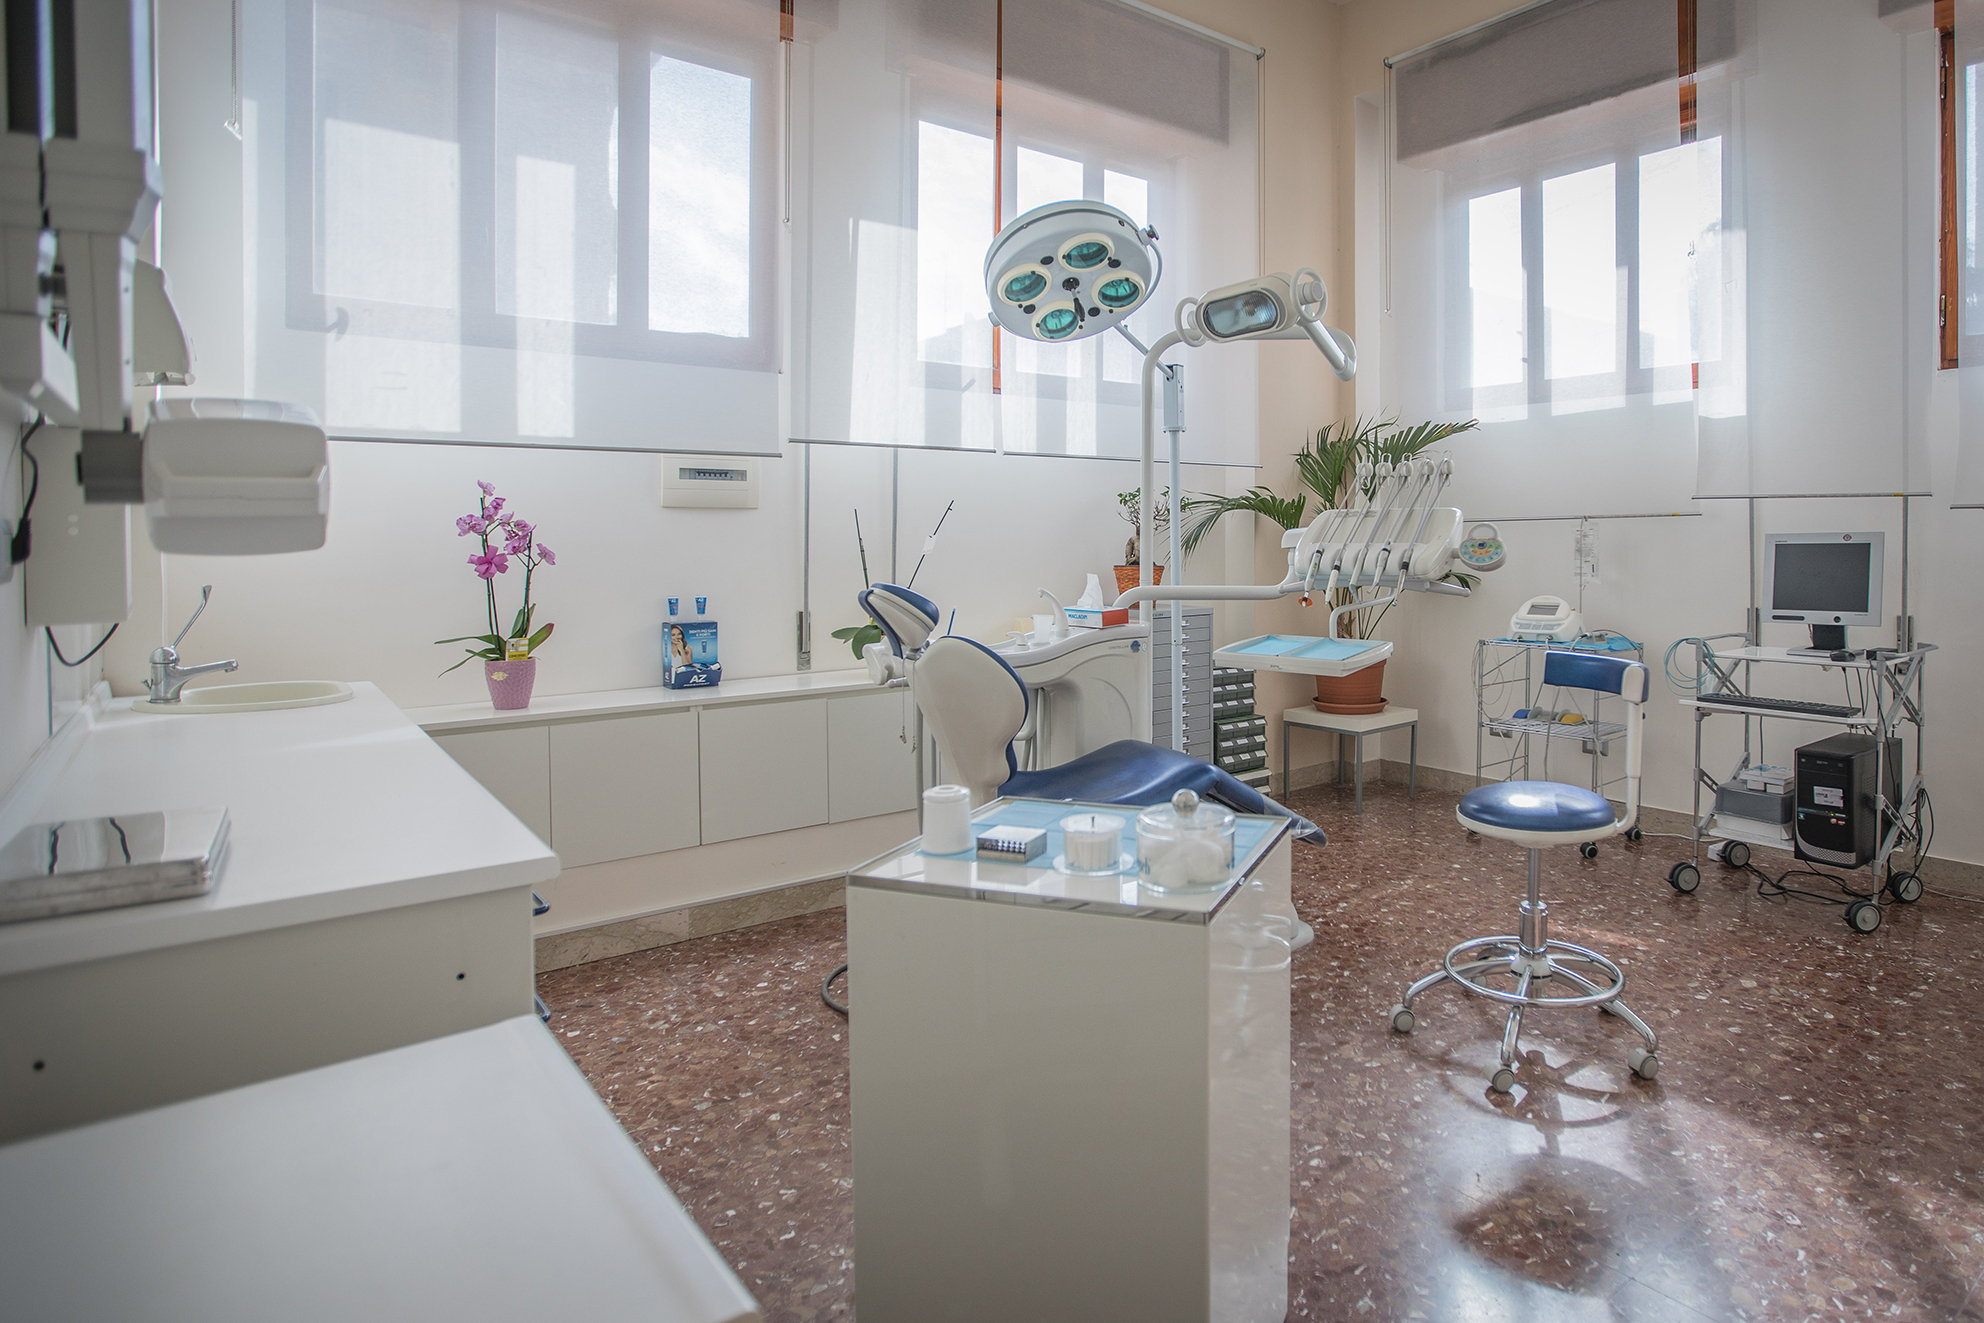 Studio Odontoiatrico Dott.ssa Minutoli